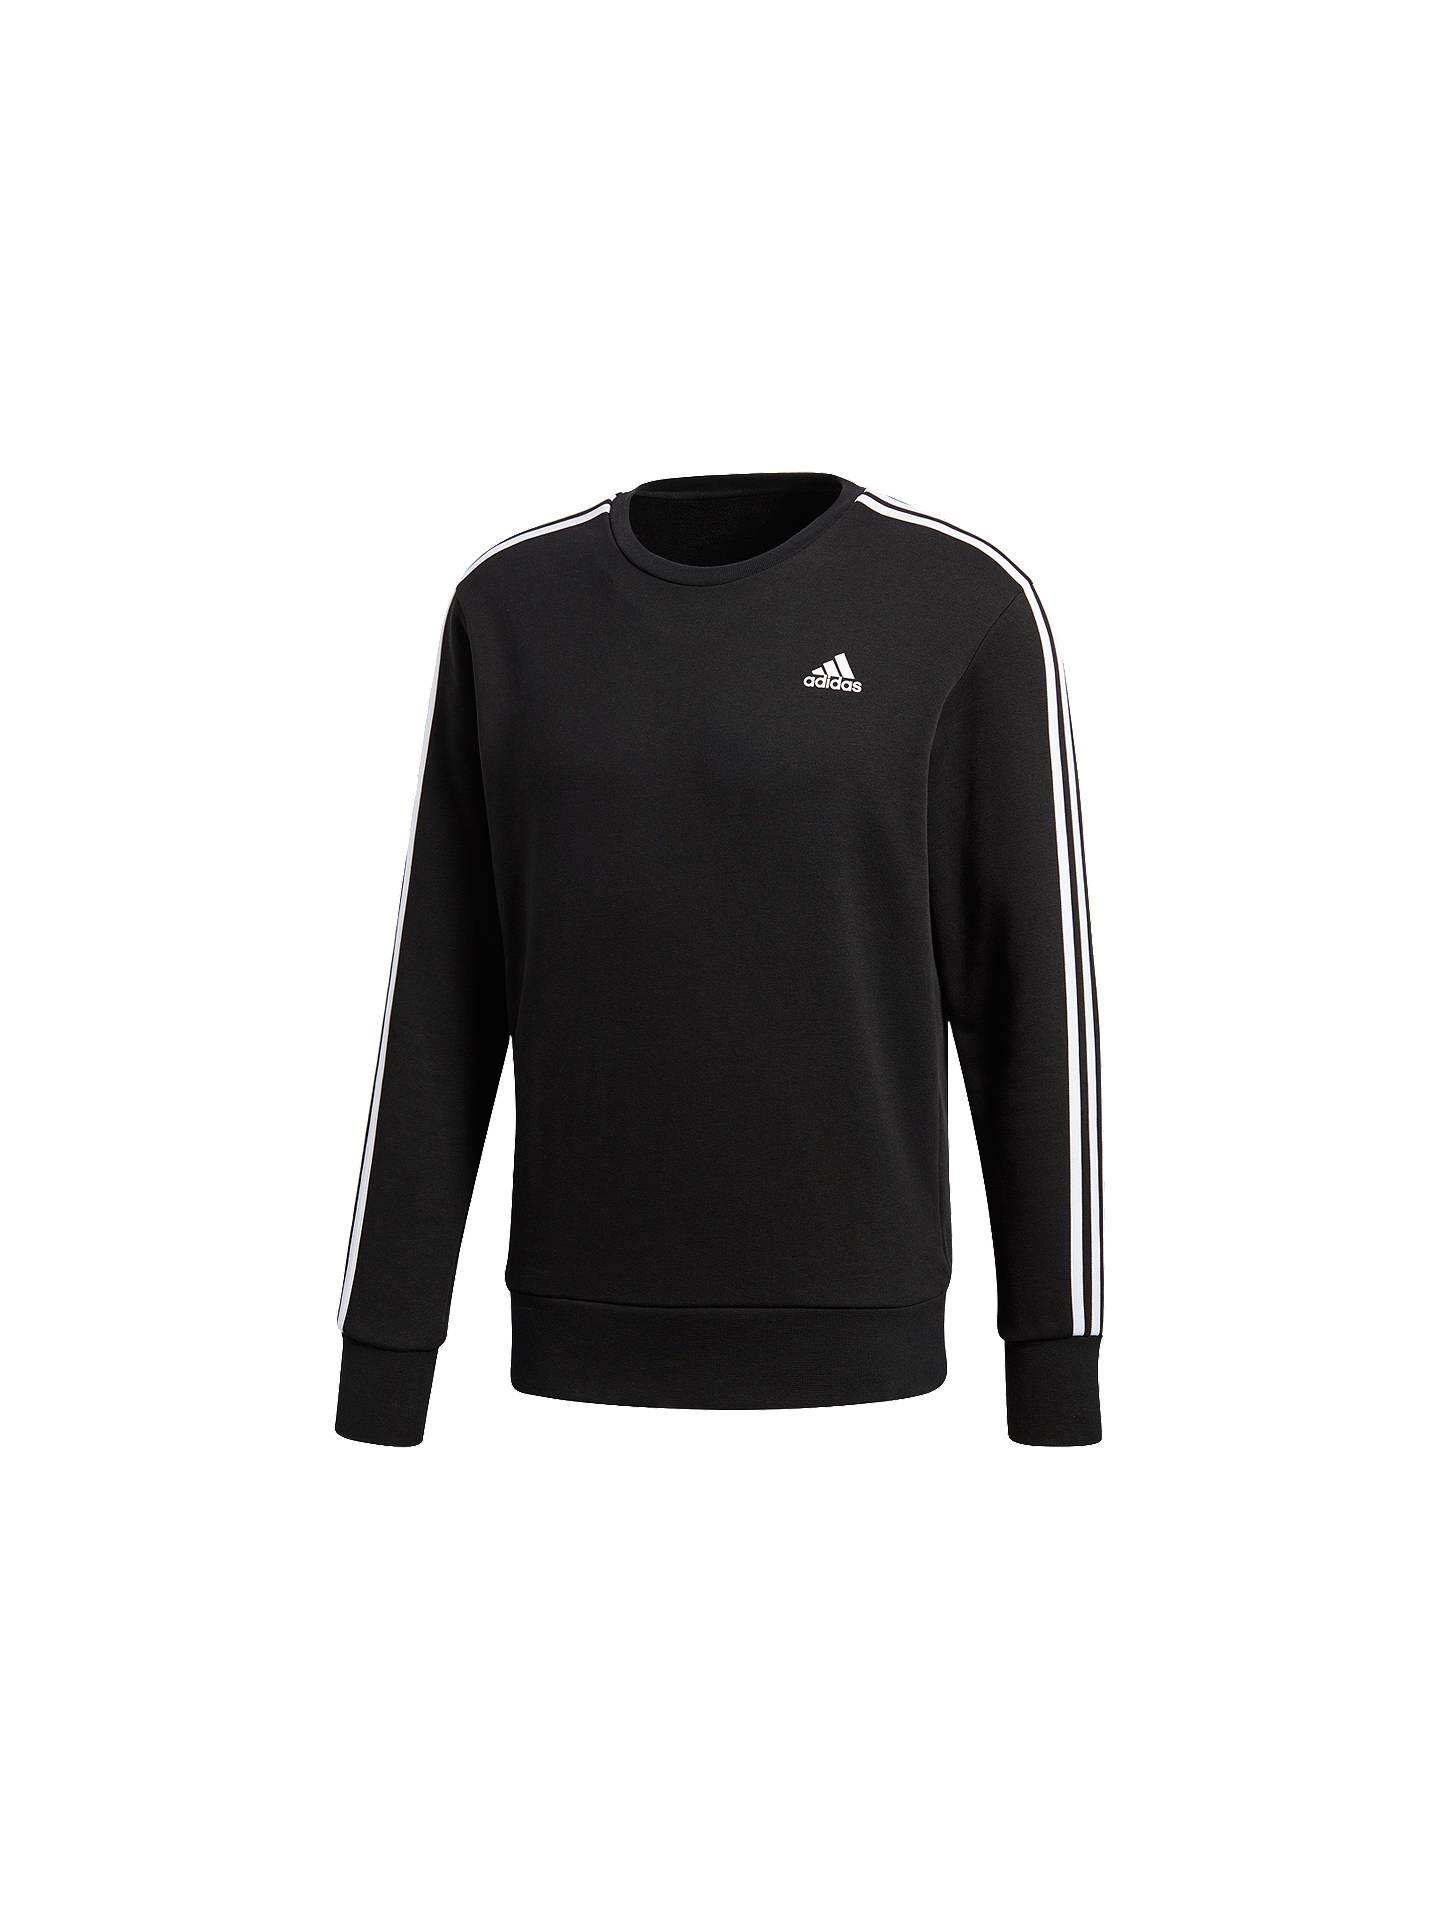 c70d8dcf3c6 Buy adidas Essentials 3-Stripes Crew Sweatshirt, Black, S Online at  johnlewis.